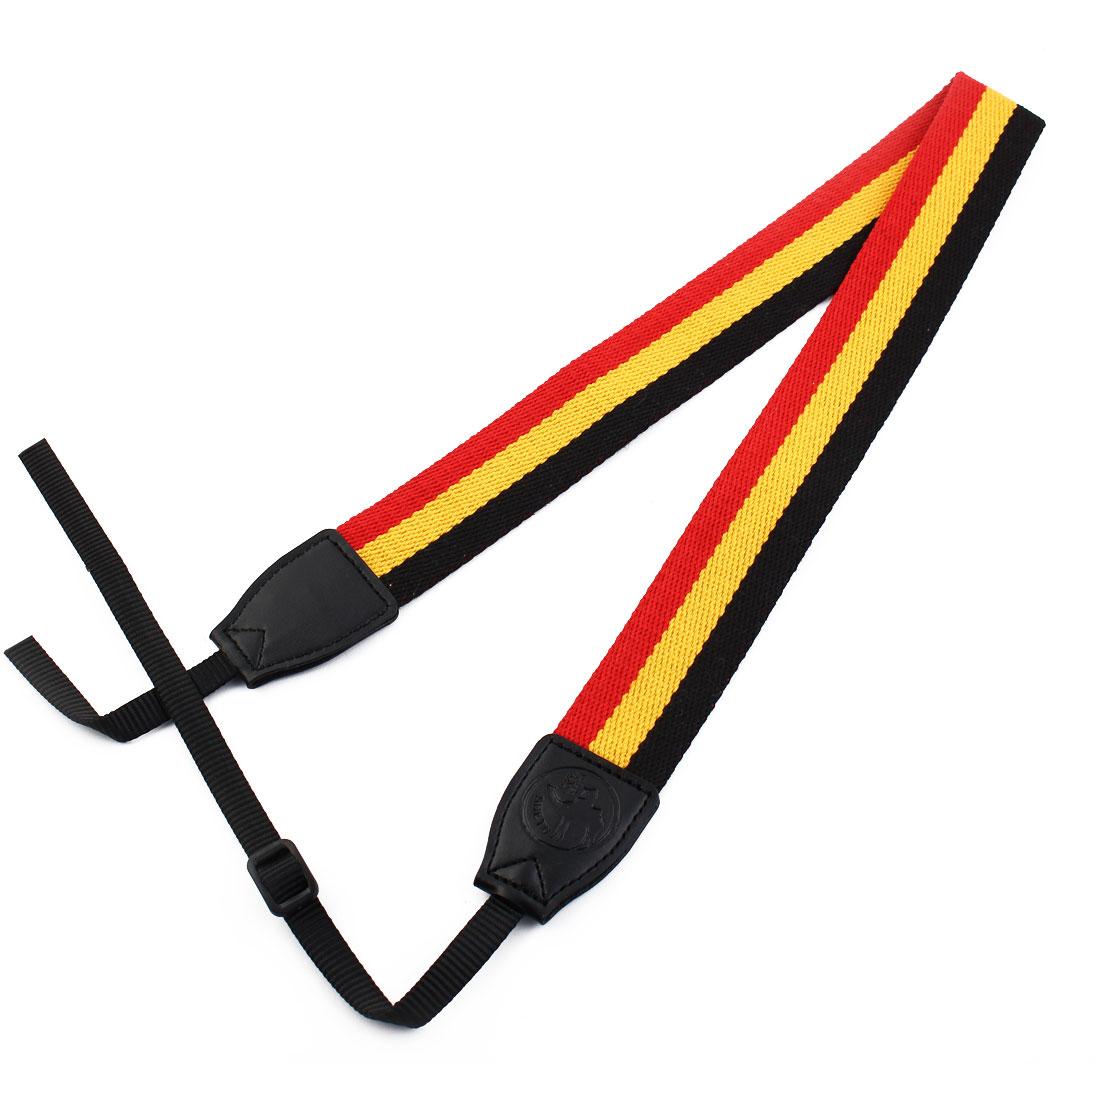 SHETU Authorized DSLR SLR Camera Anti-slip Shoulder Neck Strap Belt Red Black